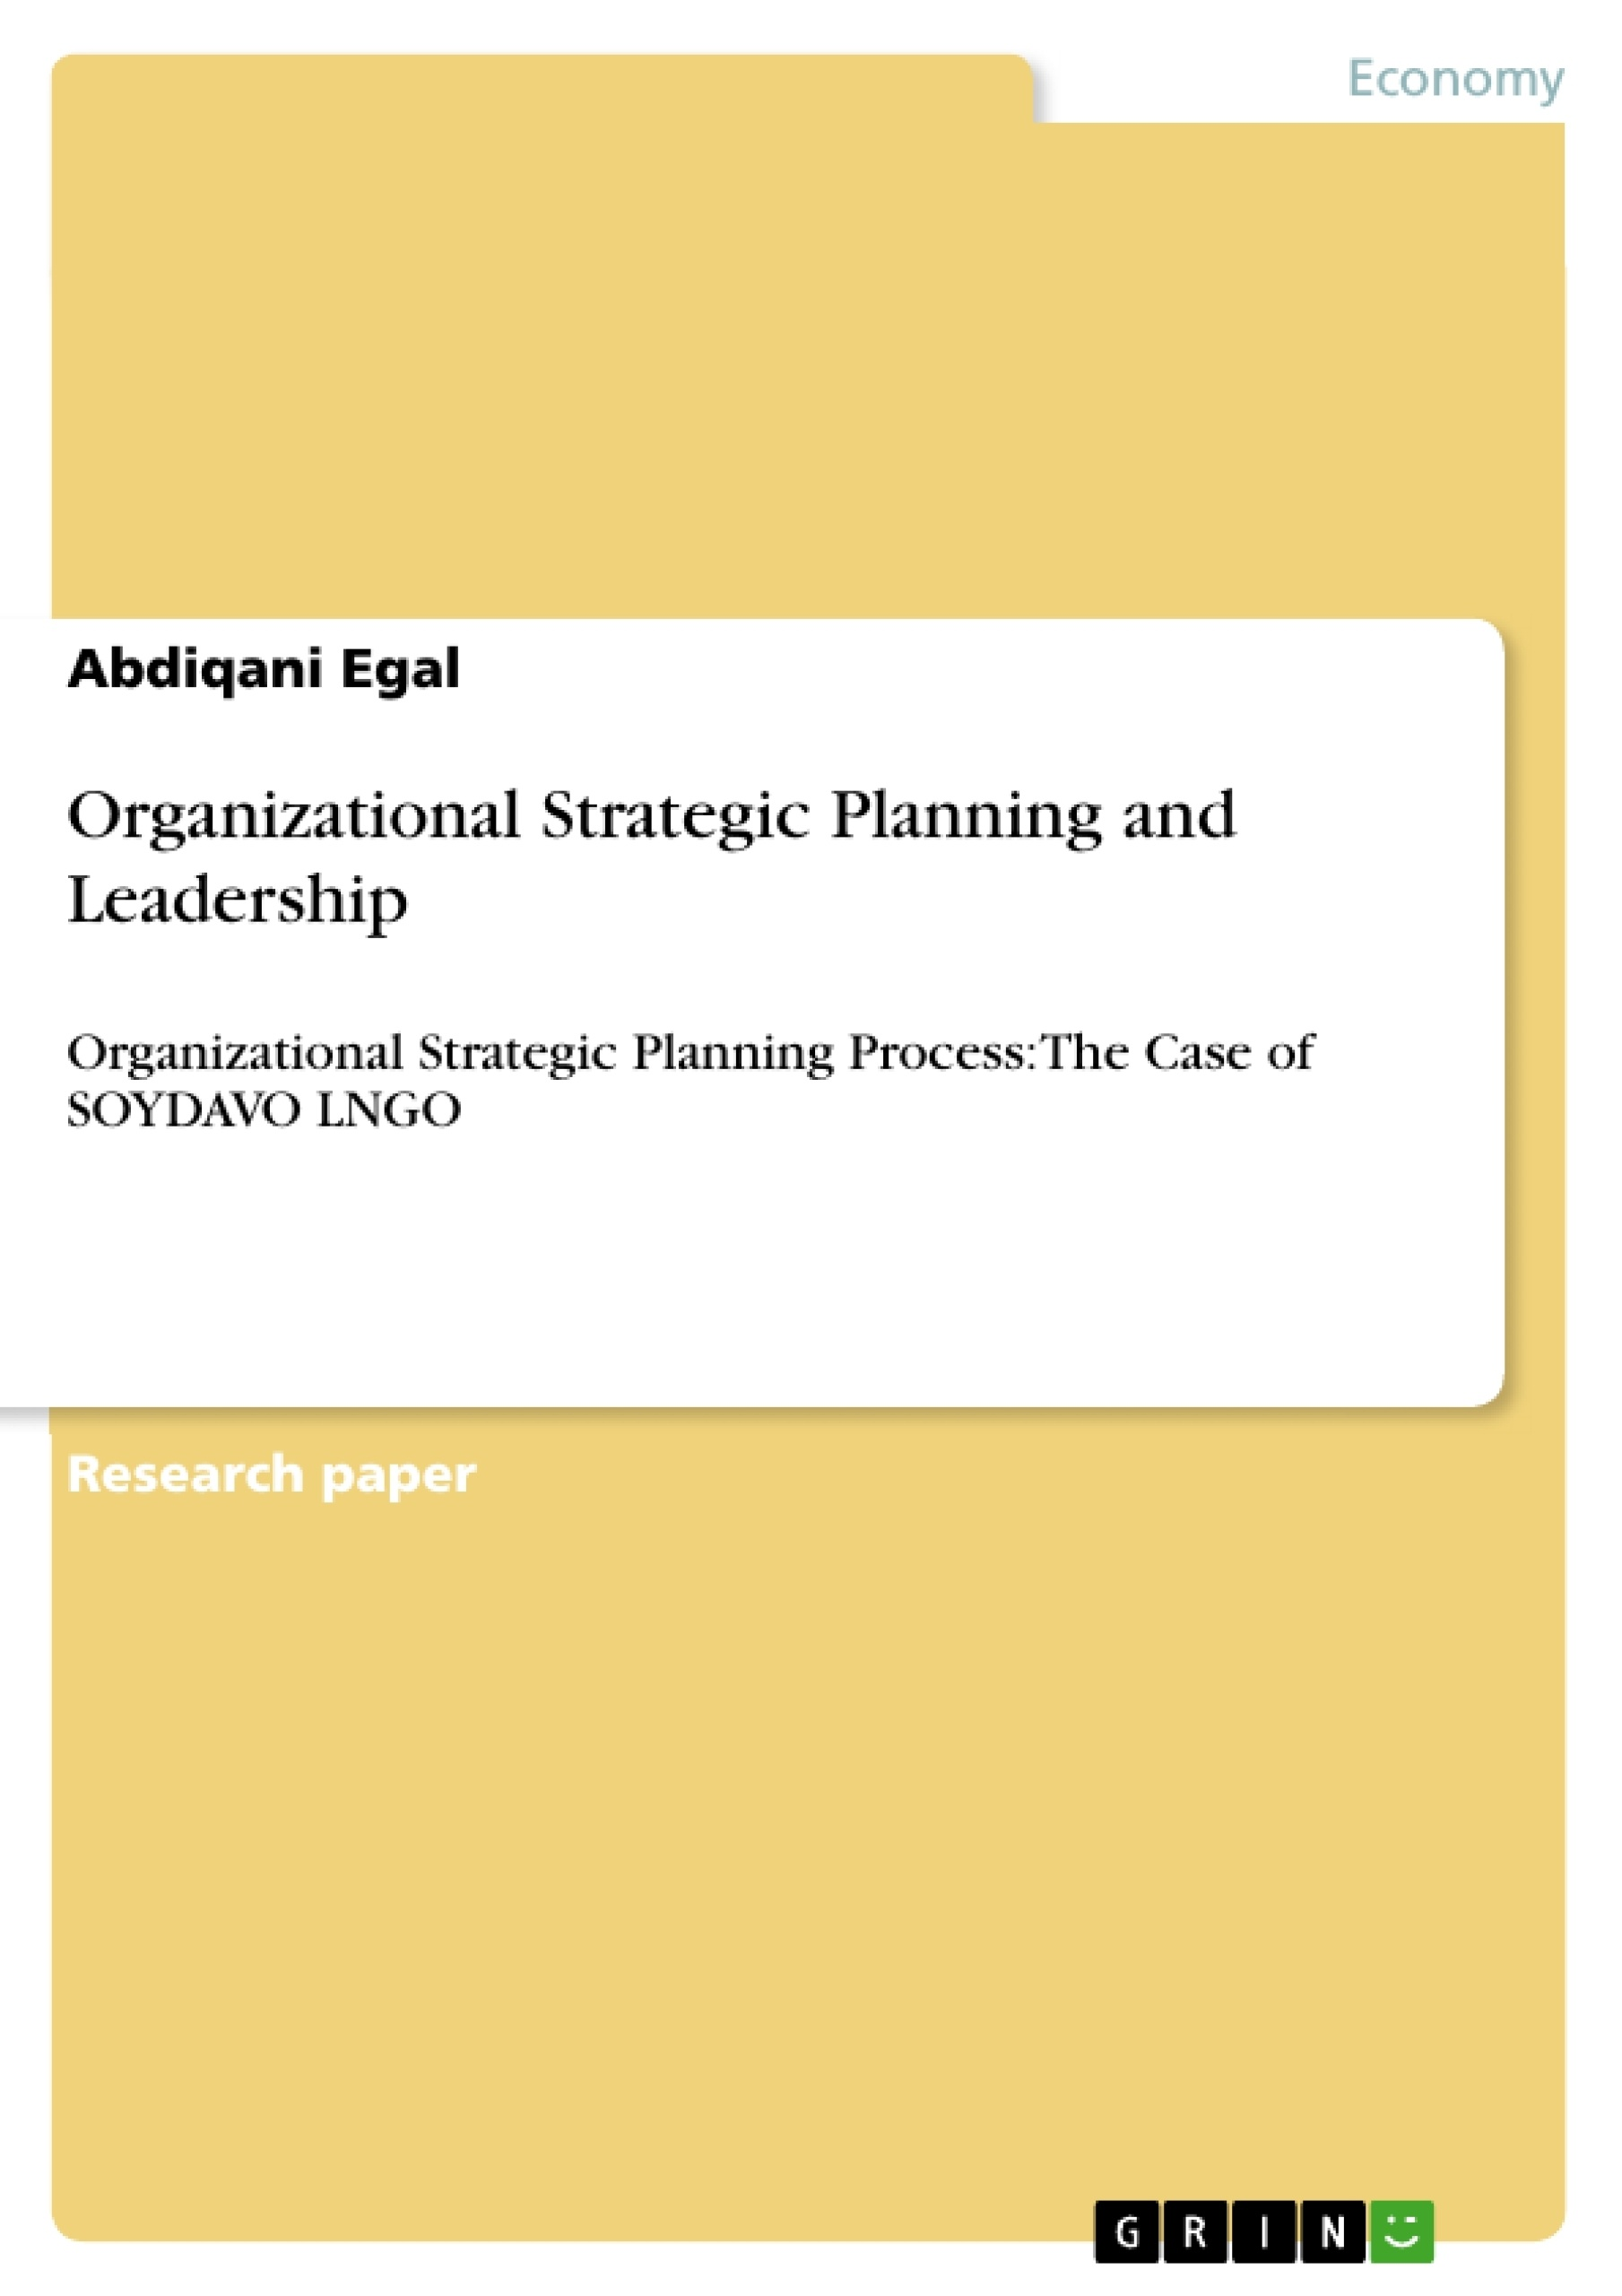 Title: Organizational Strategic Planning and Leadership